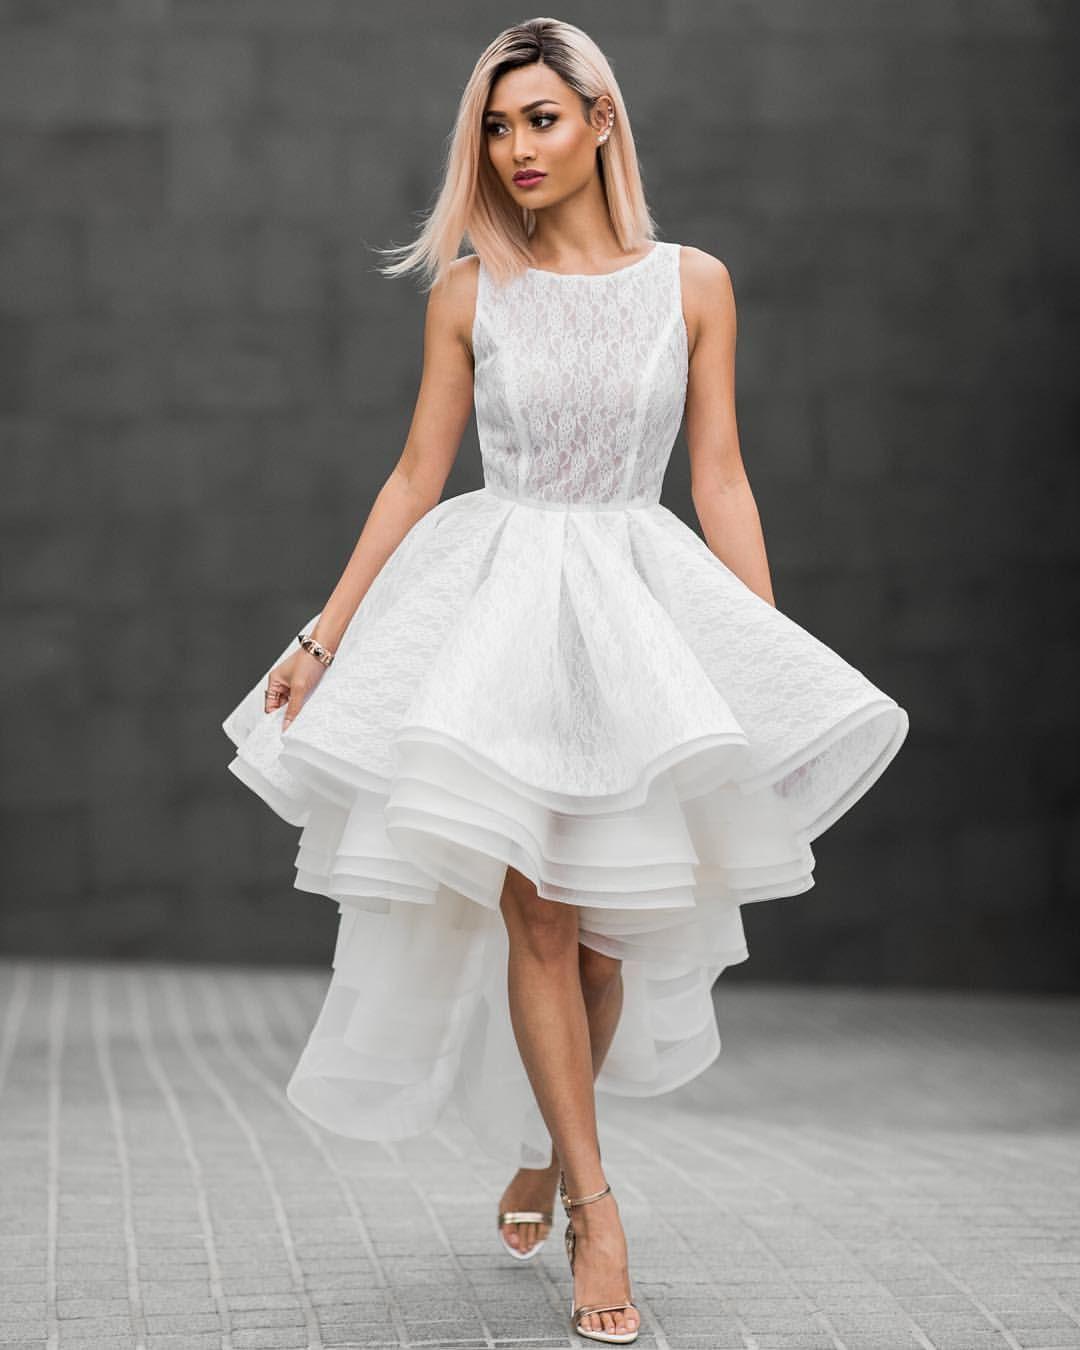 Leah dress a beautiful cocktail length dress designed by leah da